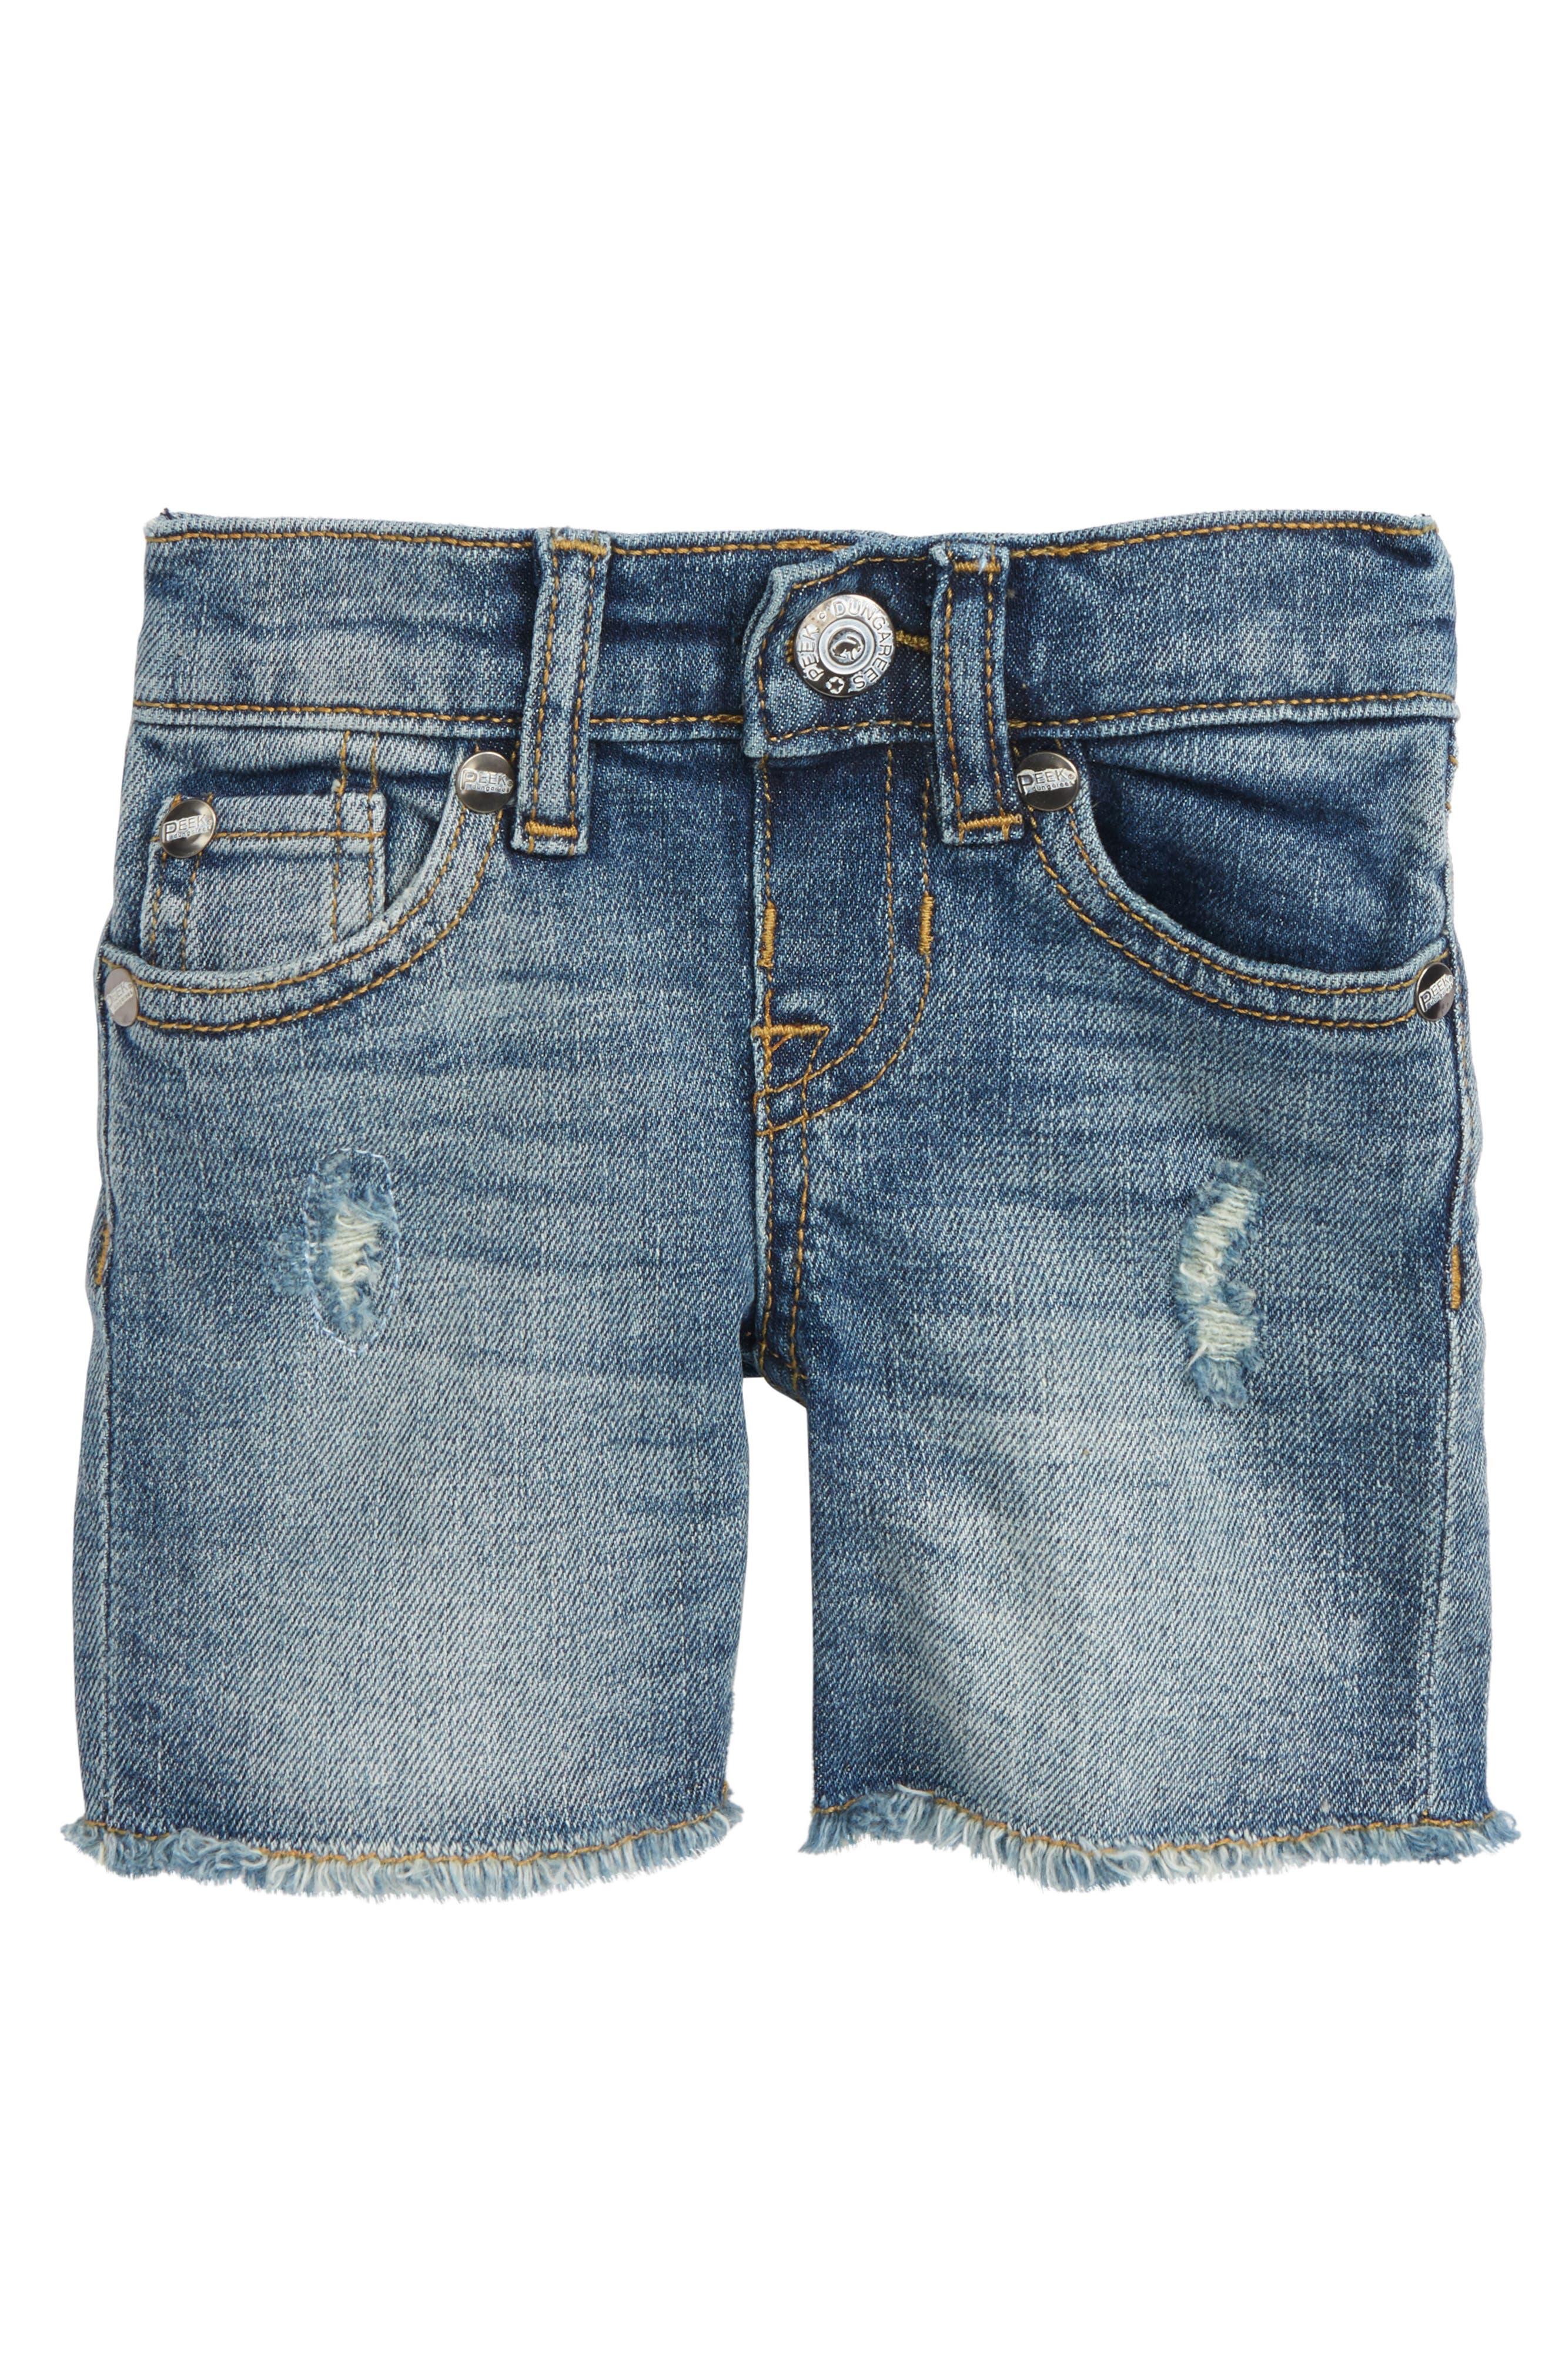 Alternate Image 1 Selected - Peek Fairfax Denim Shorts (Baby Boys)